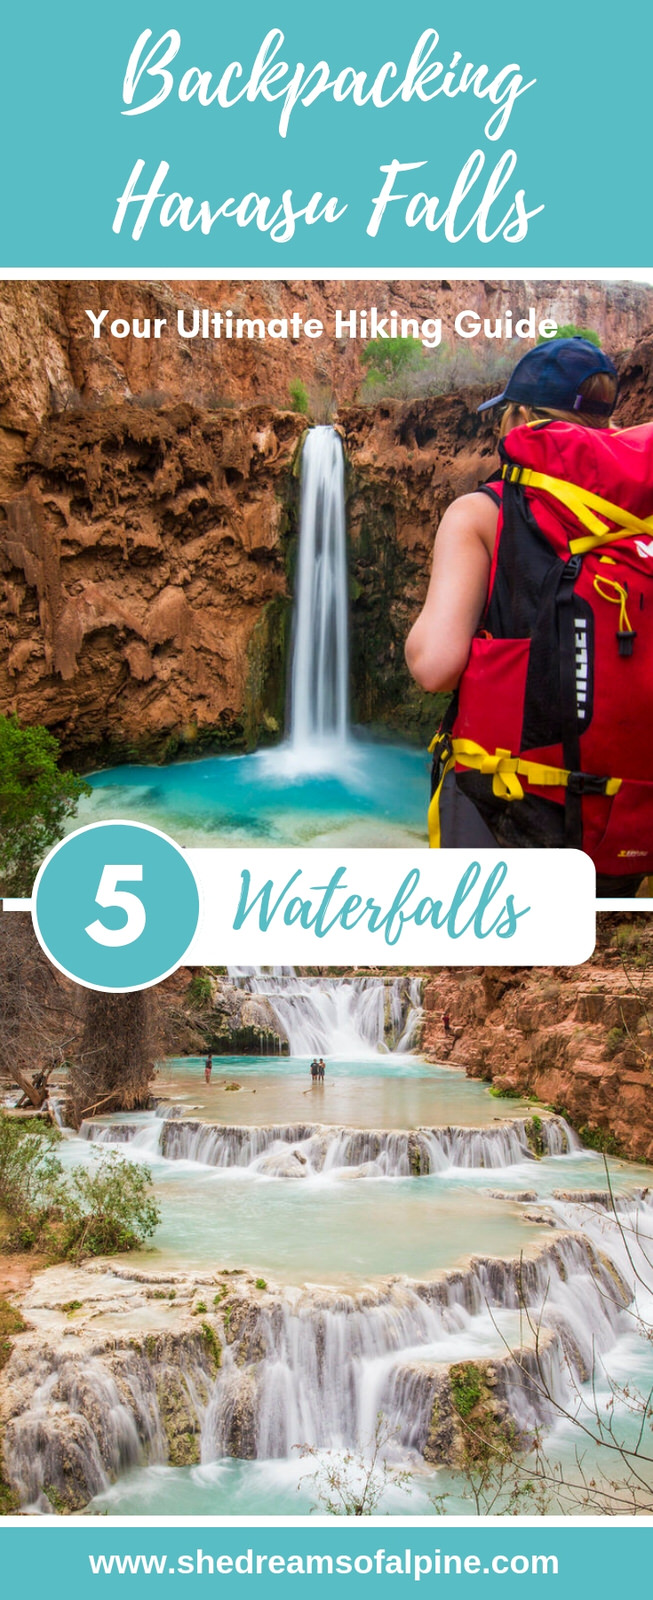 The Ultimate Guide to the Havasu Falls Hike in Arizona